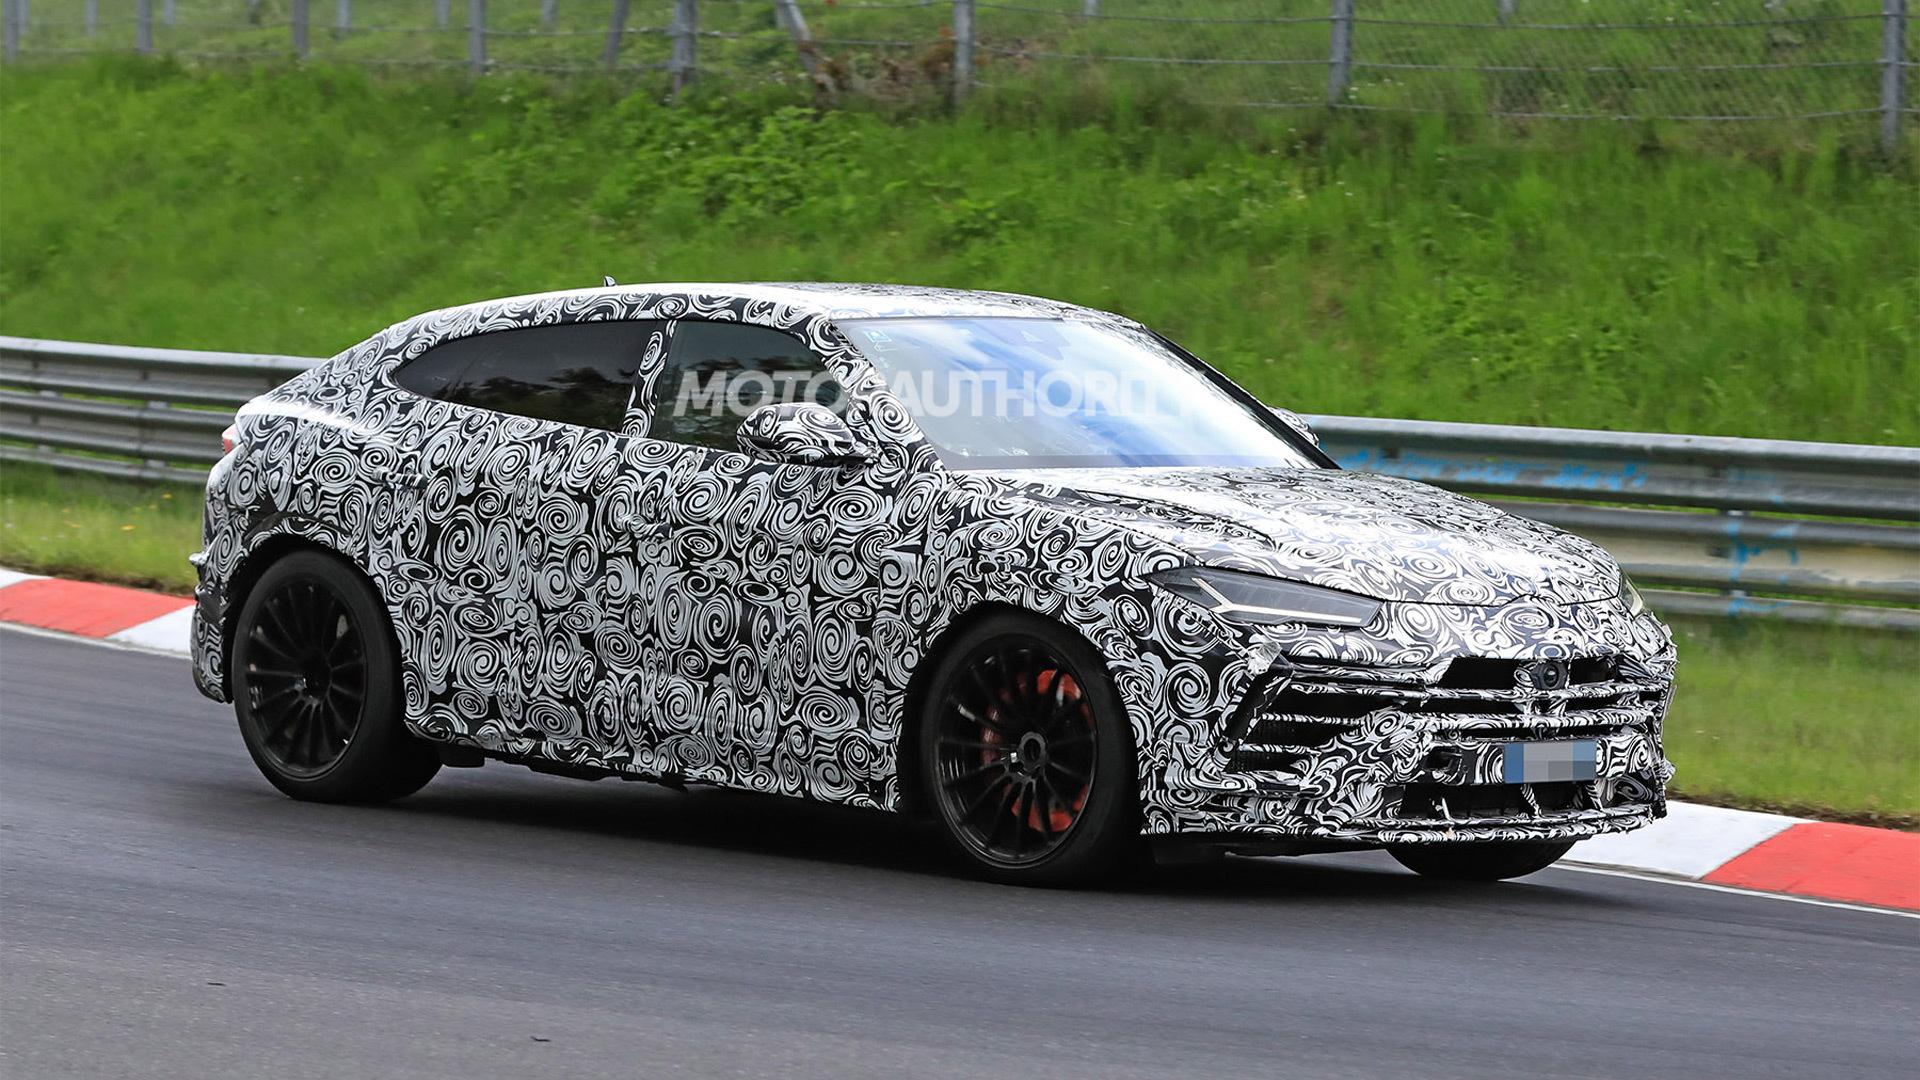 2023 Lamborghini Urus facelift spy shots - Photo credit:S. Baldauf/SB-Medien